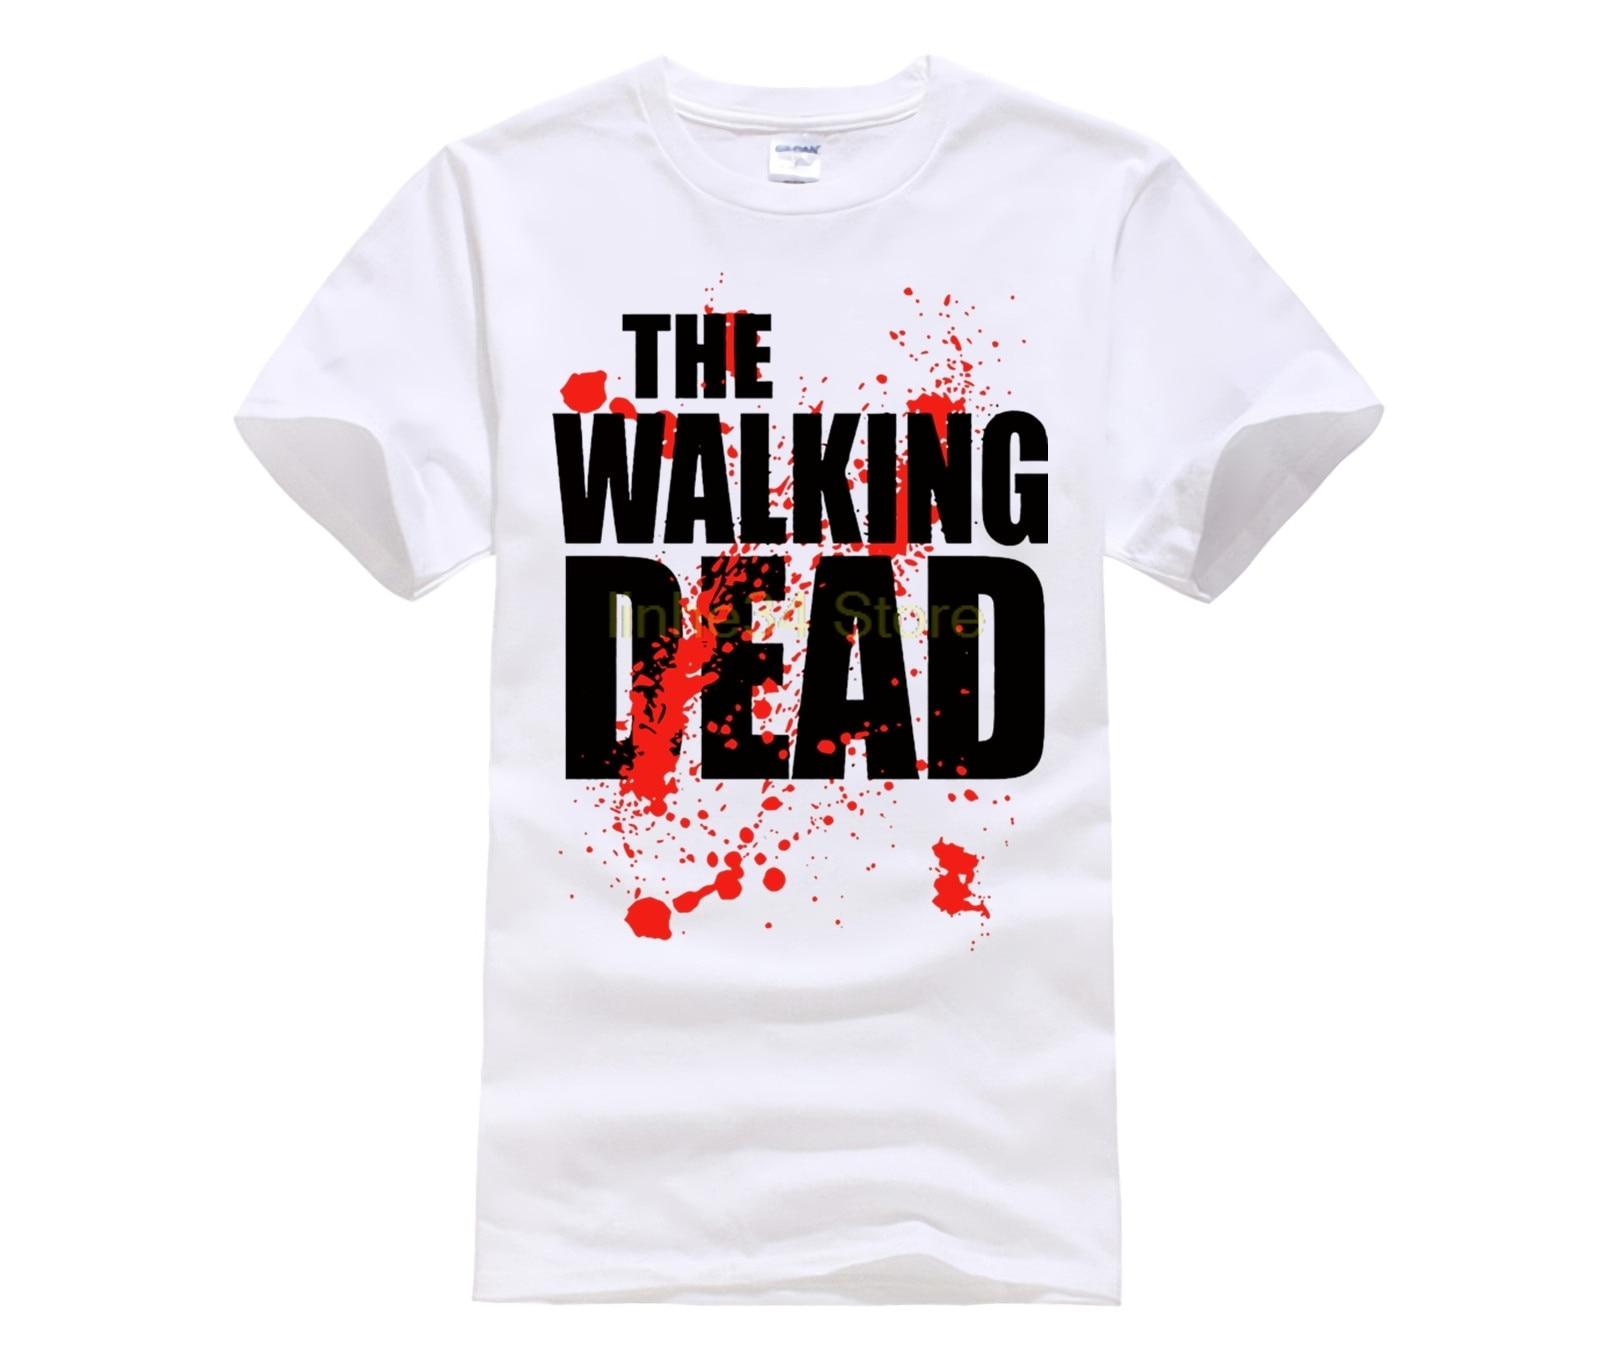 street-fashion-clothing-font-b-the-b-font-font-b-walking-b-font-font-b-dead-b-font-t-shirts-men-horror-tshirt-cotton-casual-big-size-tops-short-sleeve-camisetas